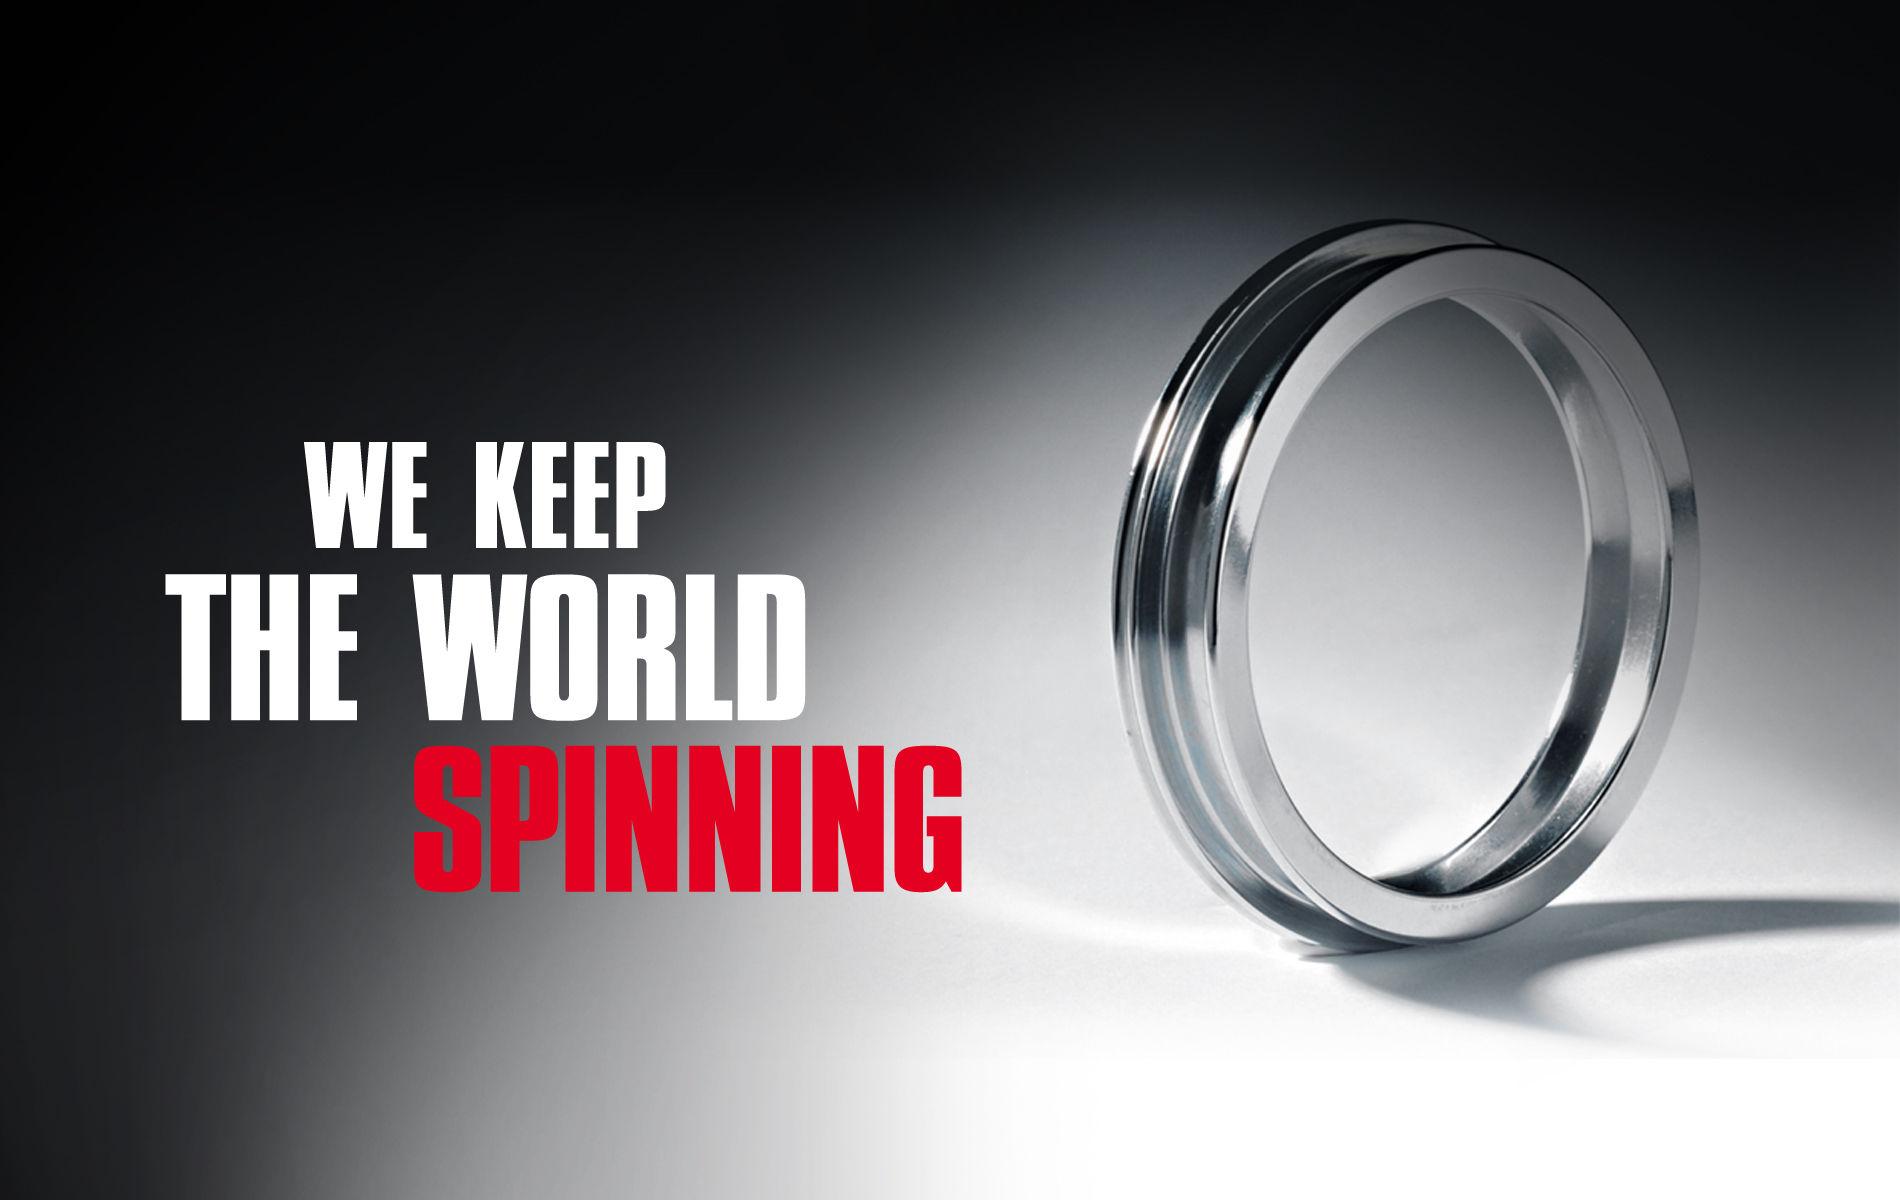 prosino borgosesia rings we keep the world spinning